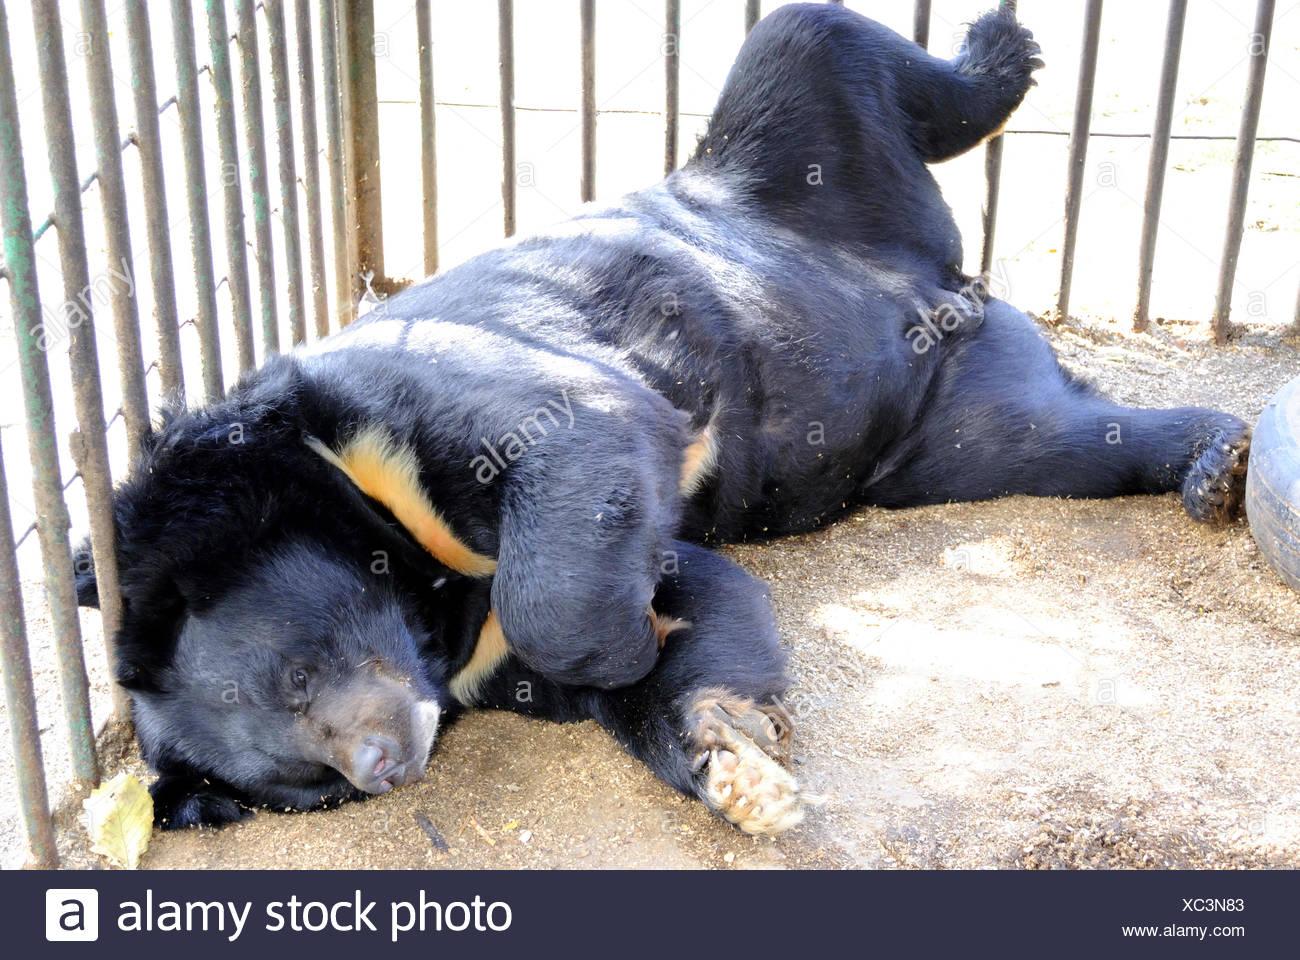 Bear - Stock Image